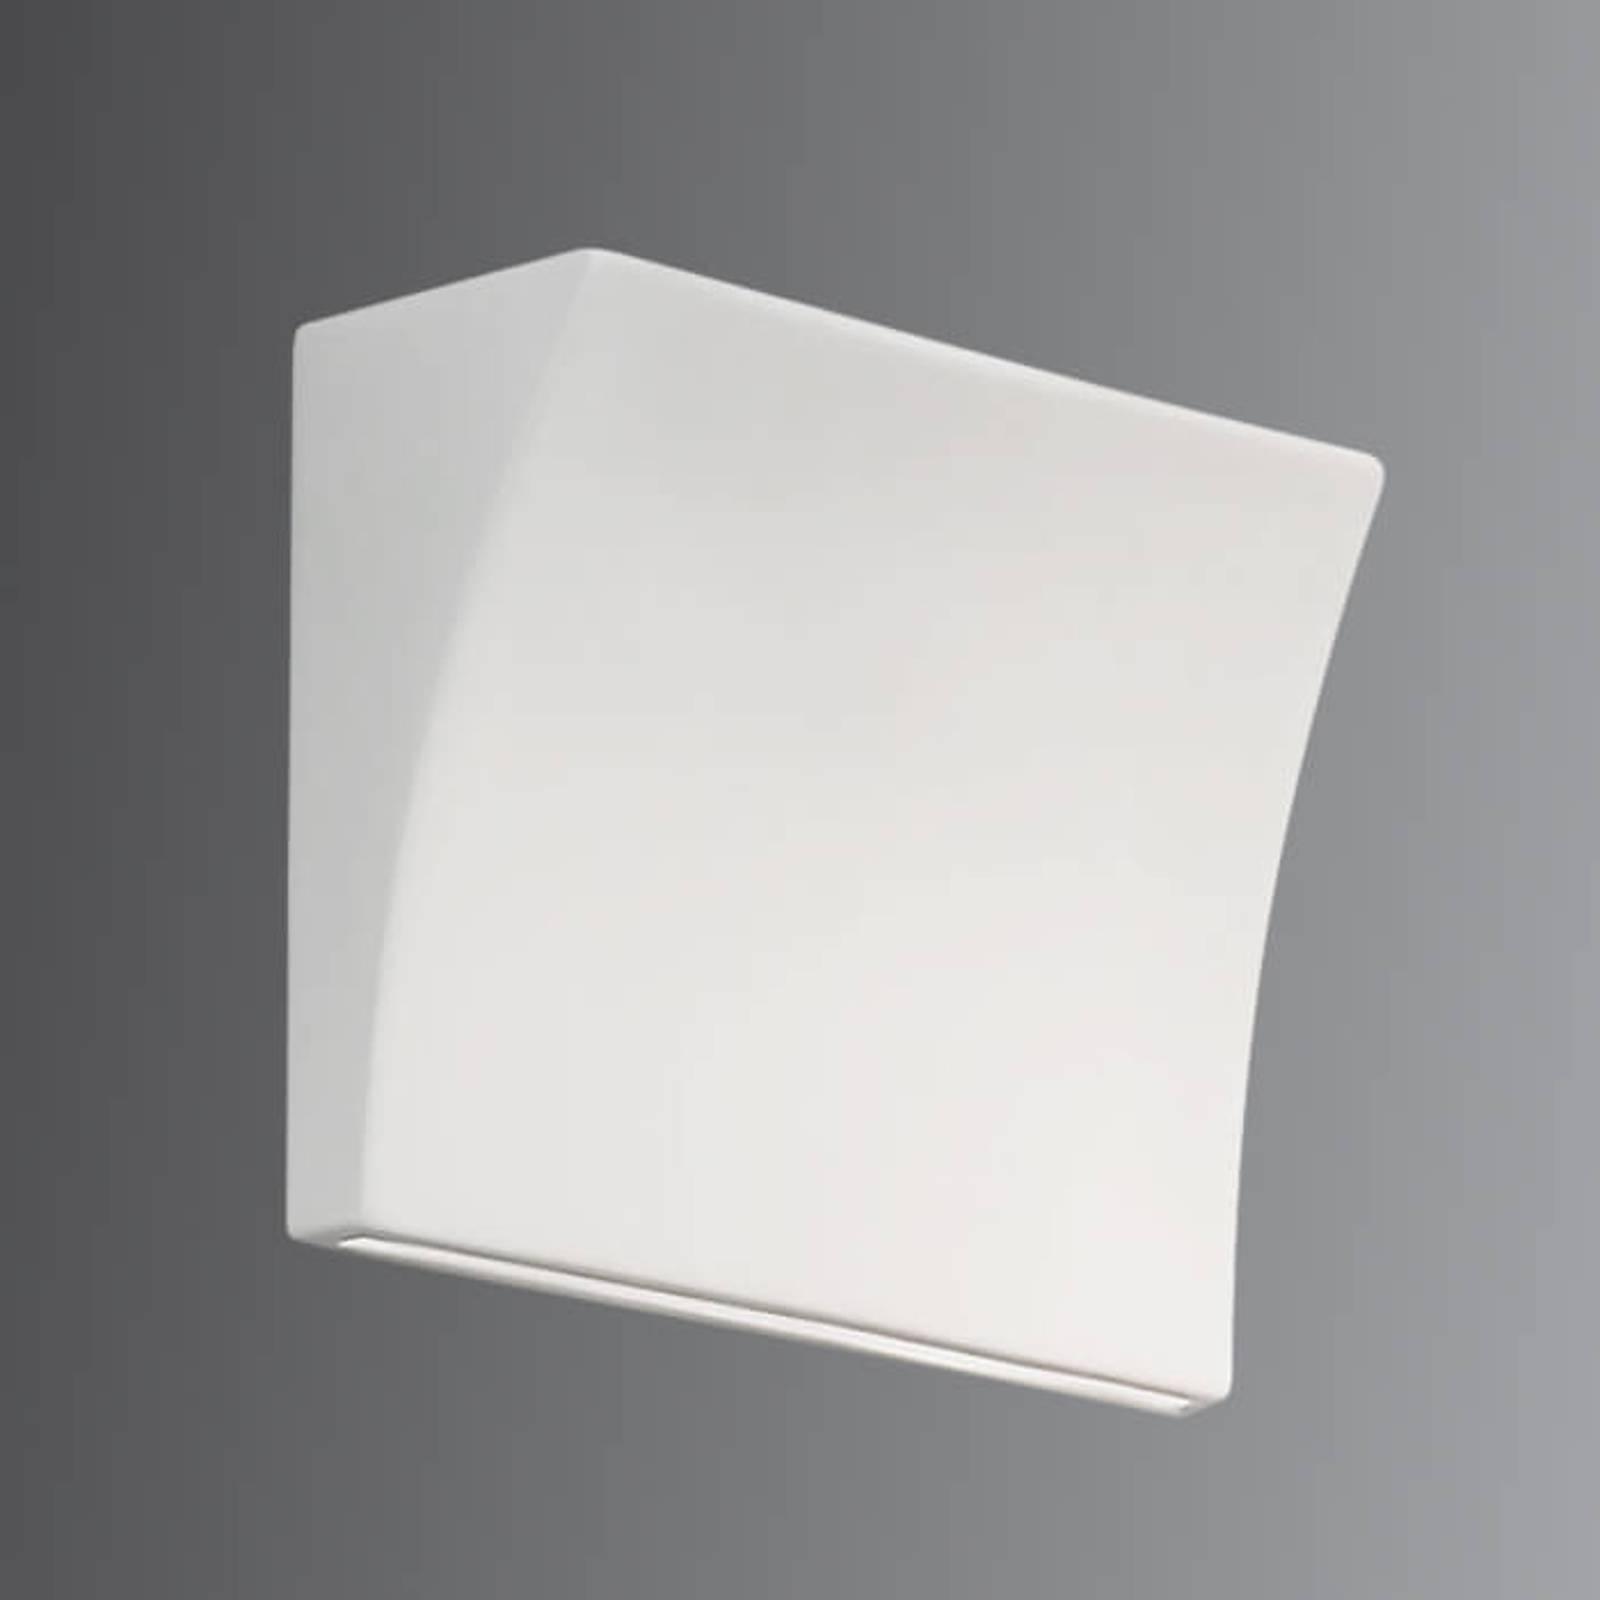 Delon-design-seinävalaisin, leveys 18 cm